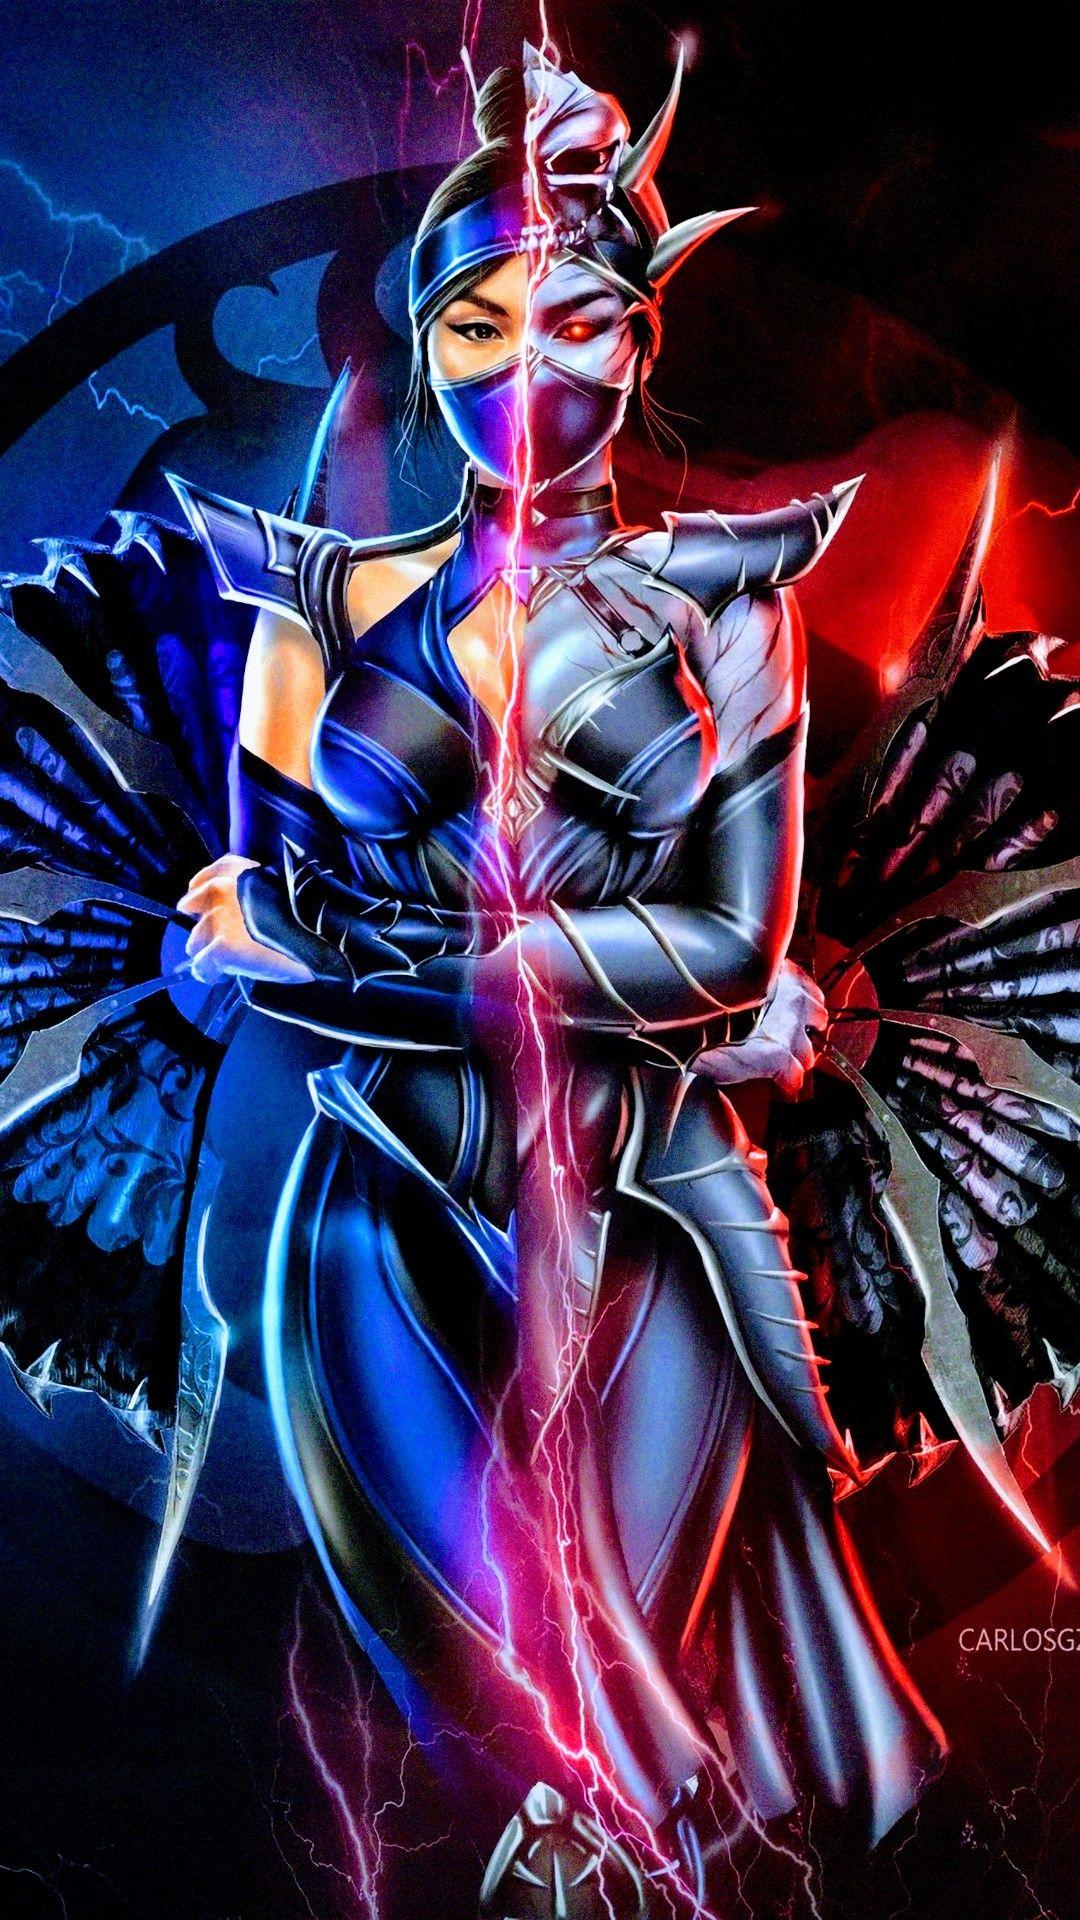 Kitana Mortal Kombat Mortal Kombat Art Mortal Kombat